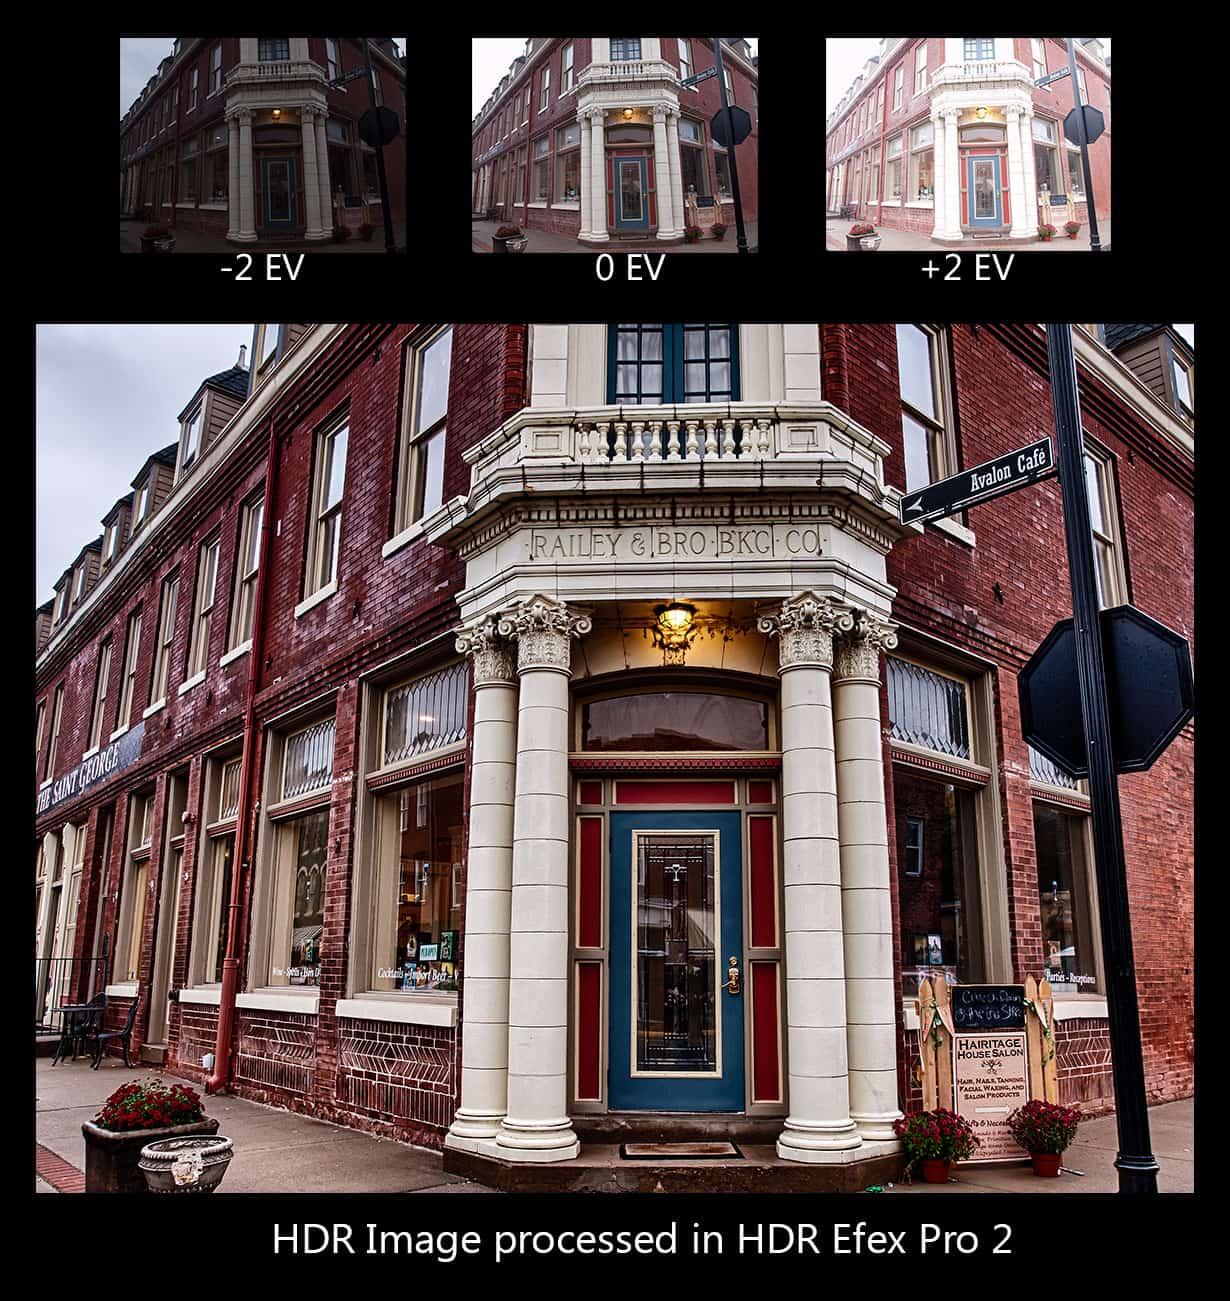 HDR Efex Pro 2 Tutorial